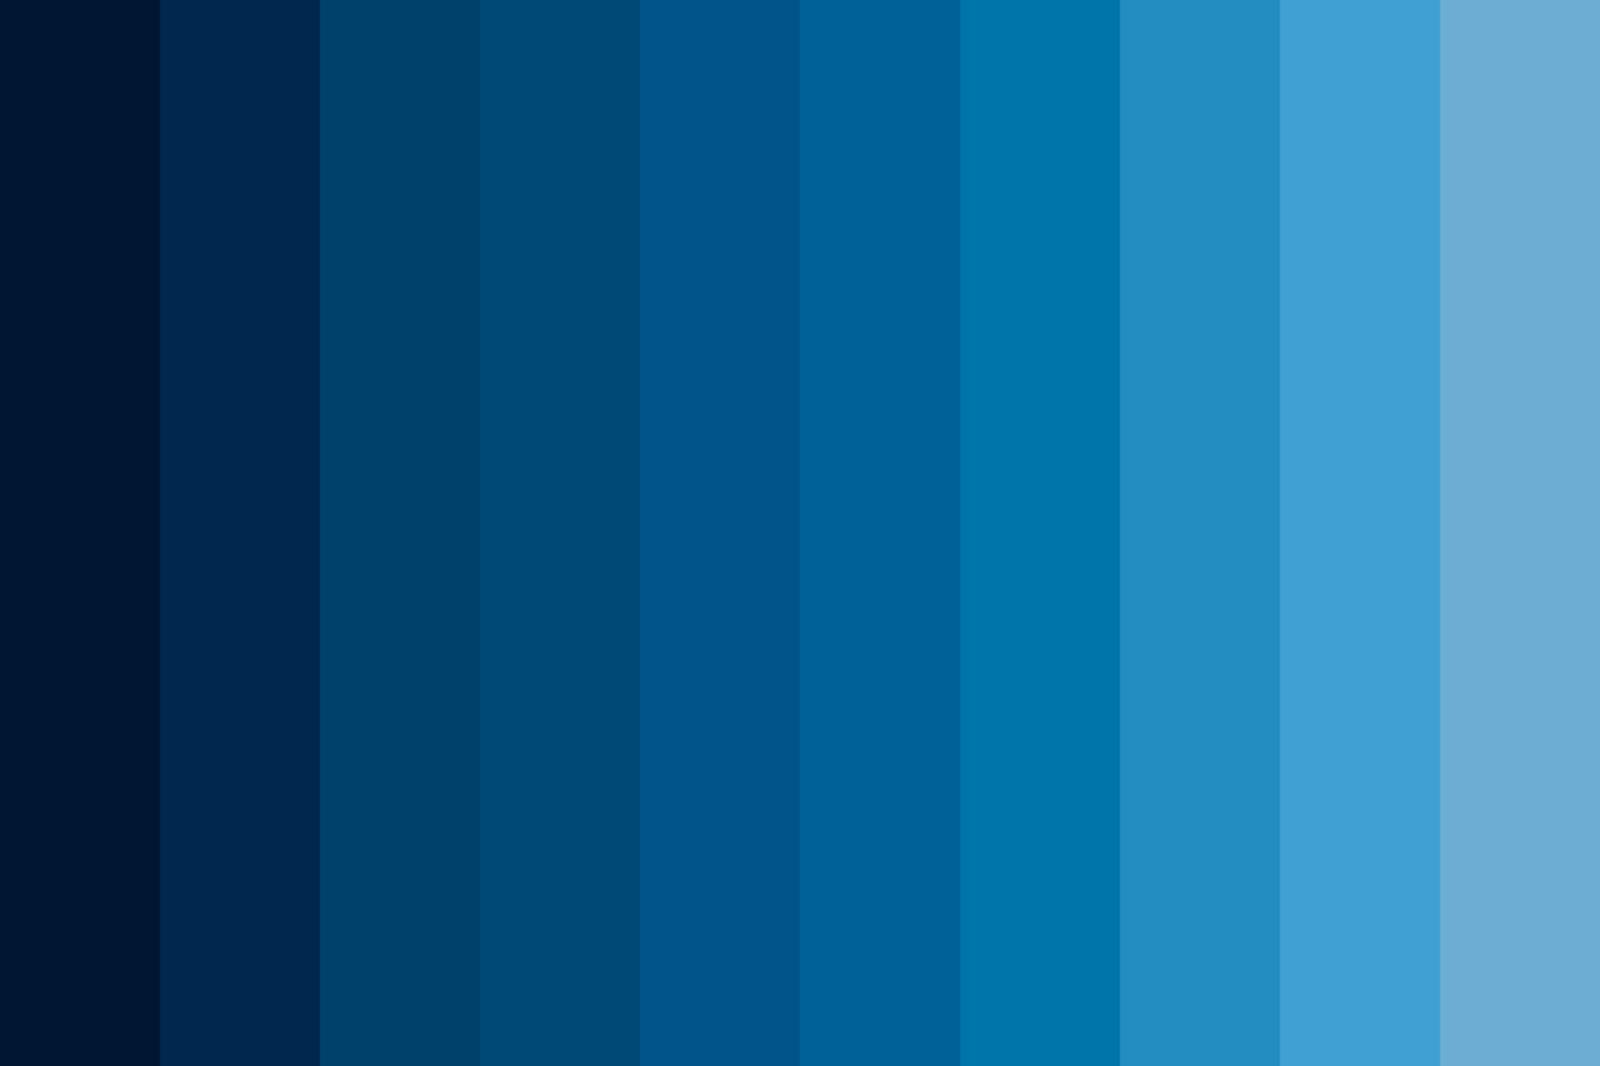 Farbkonzept